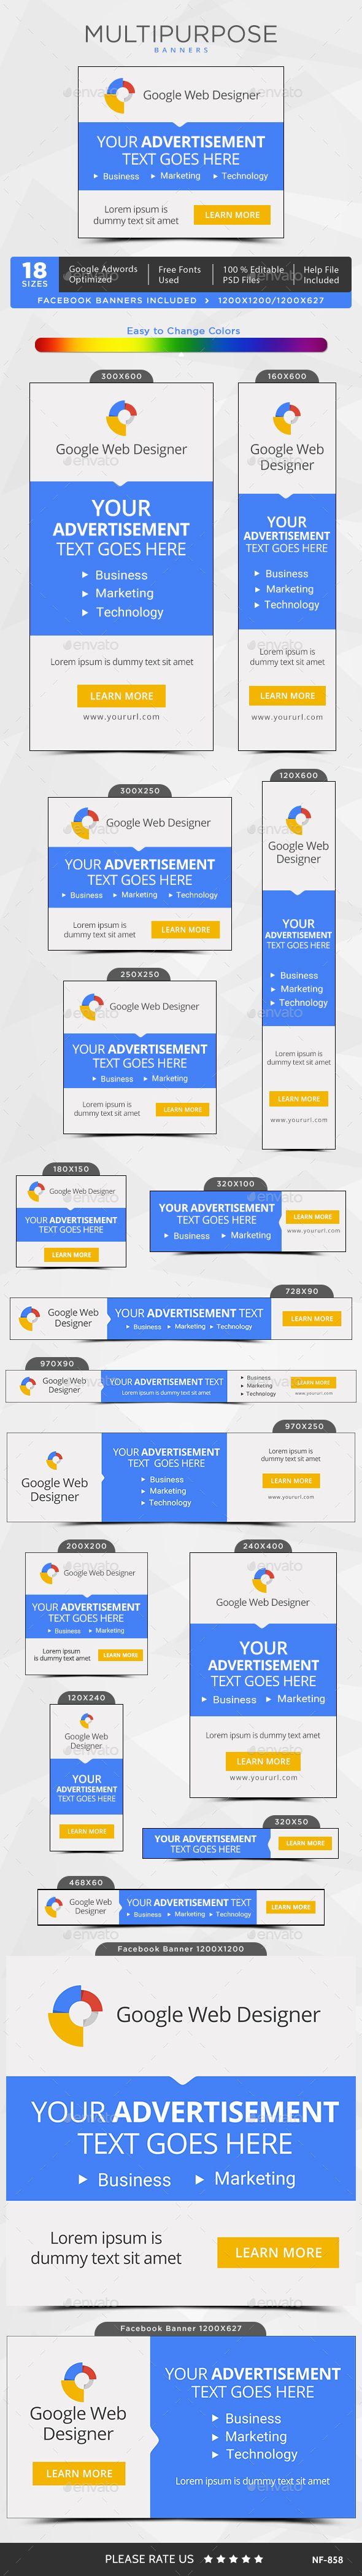 Multipurpose Web Banners Template PSD #design #ads Download: http://graphicriver.net/item/multipurpose-banners/13876779?ref=ksioks